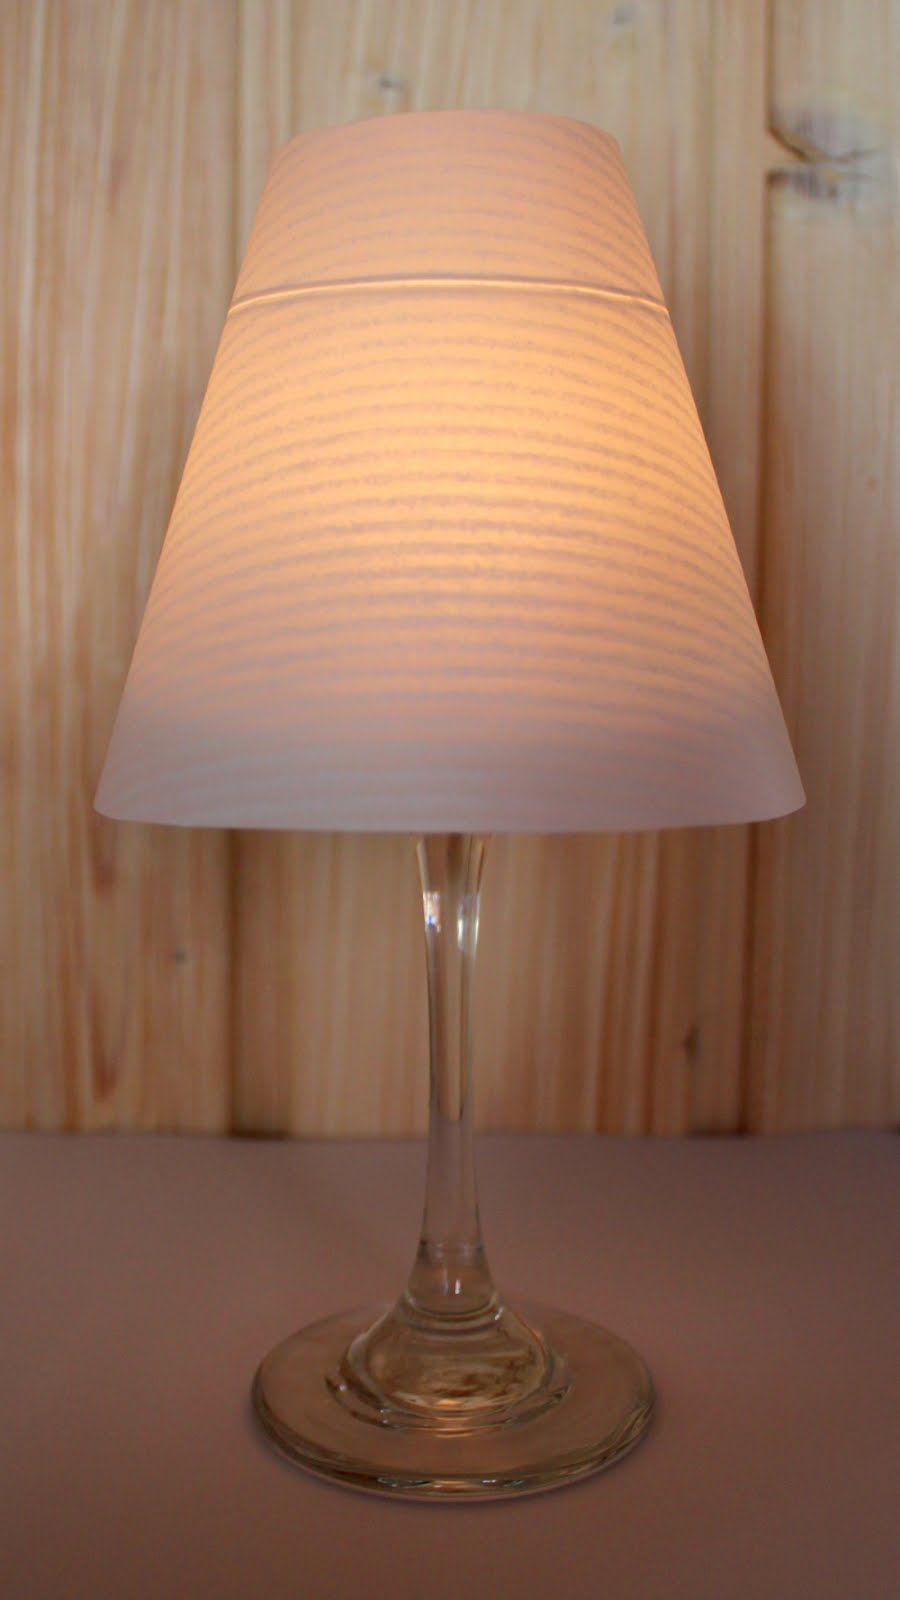 bekikilicious diy lampenschirm f r weinglas selber machen deko lampenschirm basteln. Black Bedroom Furniture Sets. Home Design Ideas